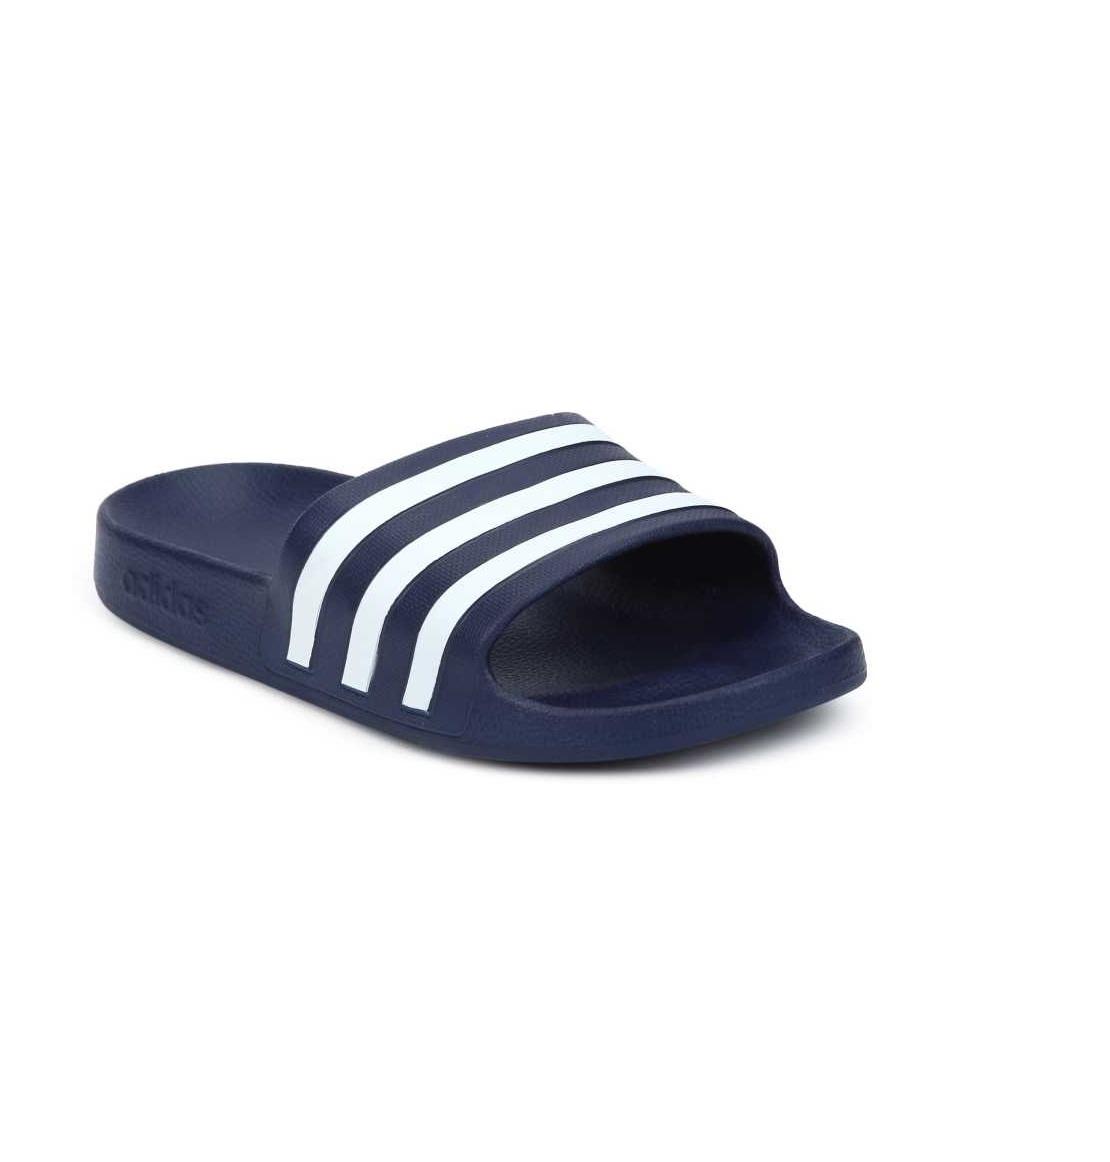 adidas | ADIDAS Men ADILETTE AQUA Flip Flop Slides